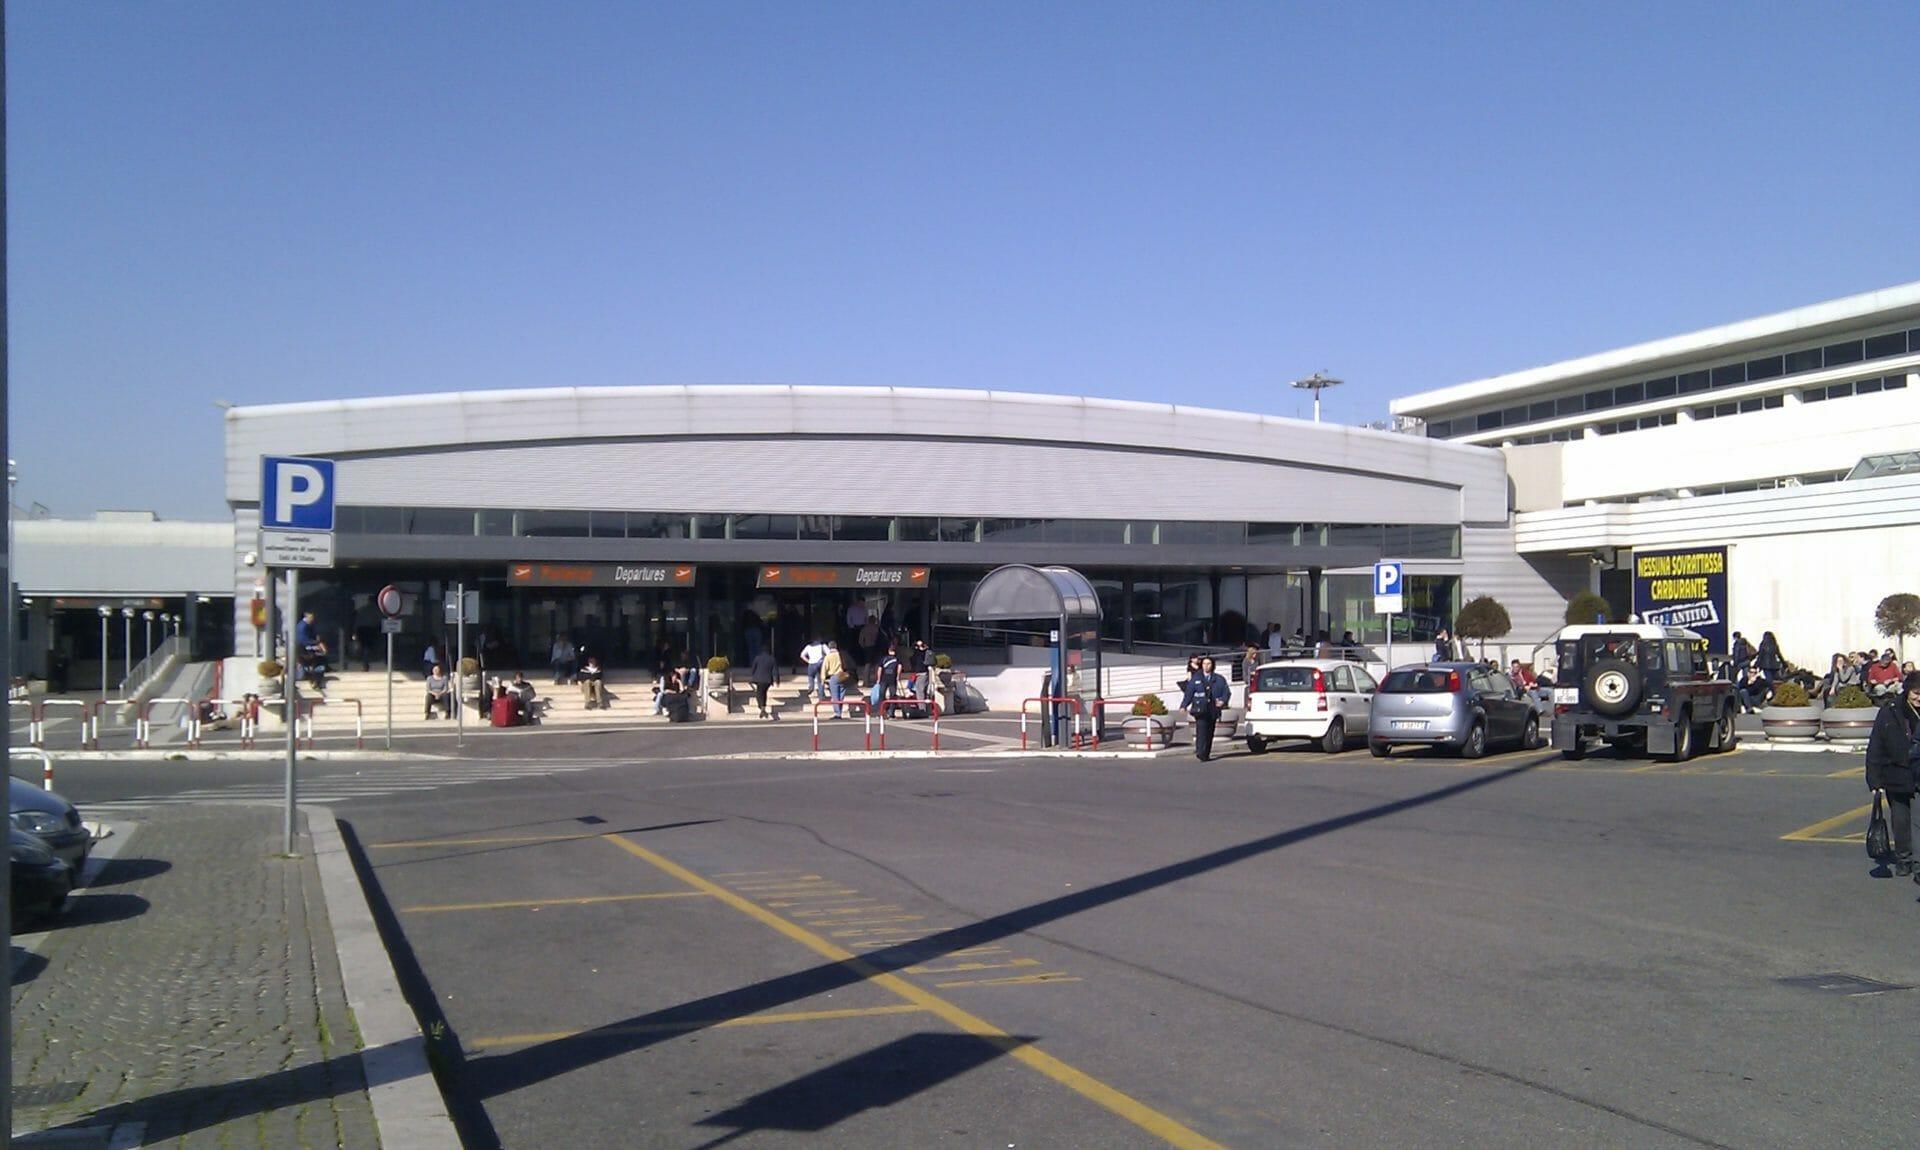 Rome international airport Ciampino